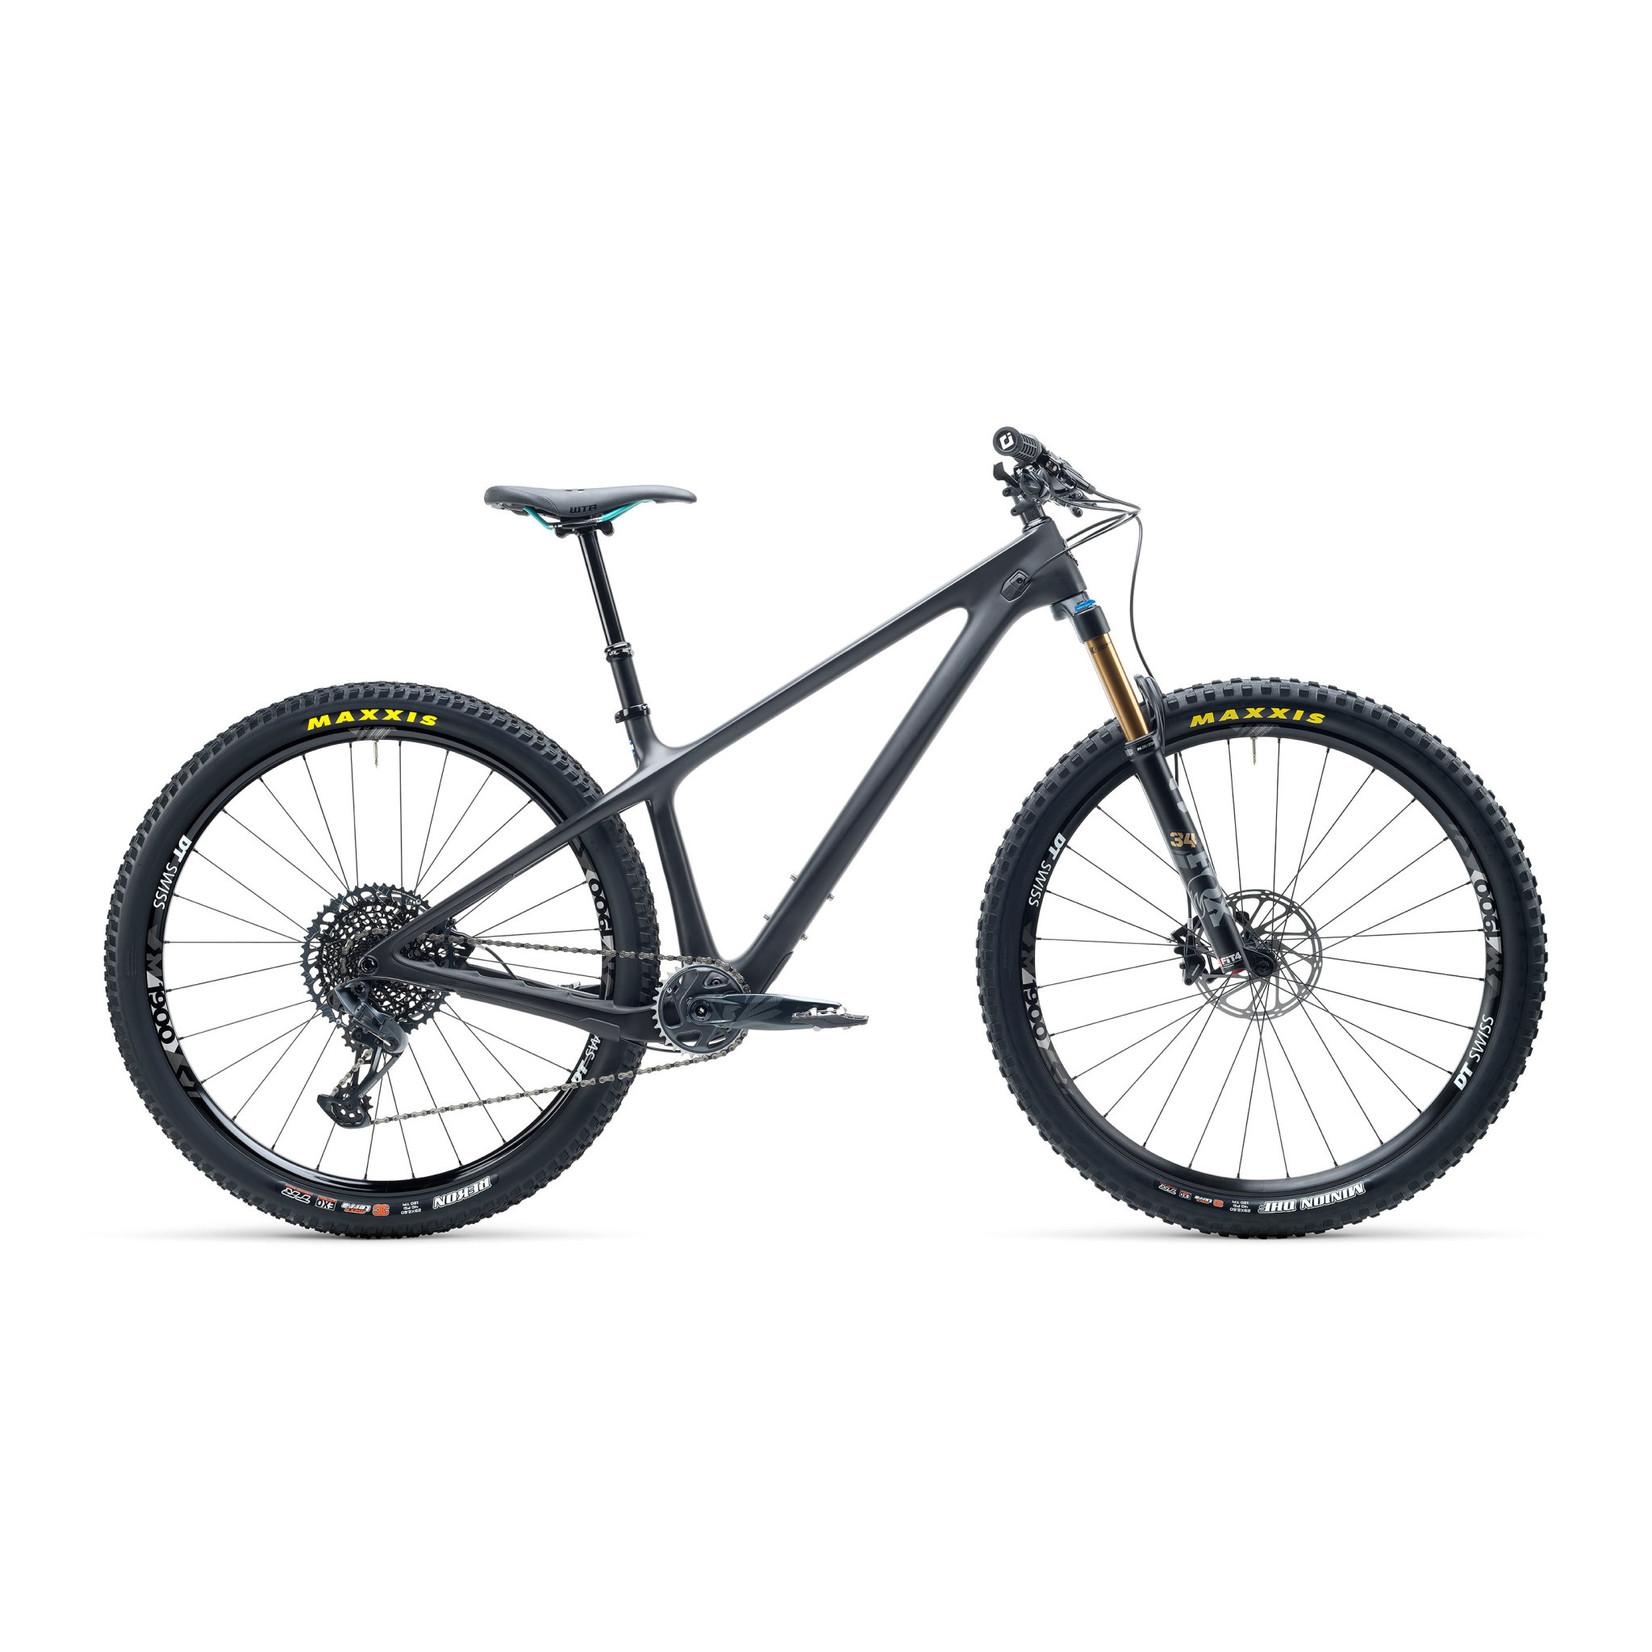 Yeti Cycles Yeti ARC C2 RAW XL (Factory Upgrade)